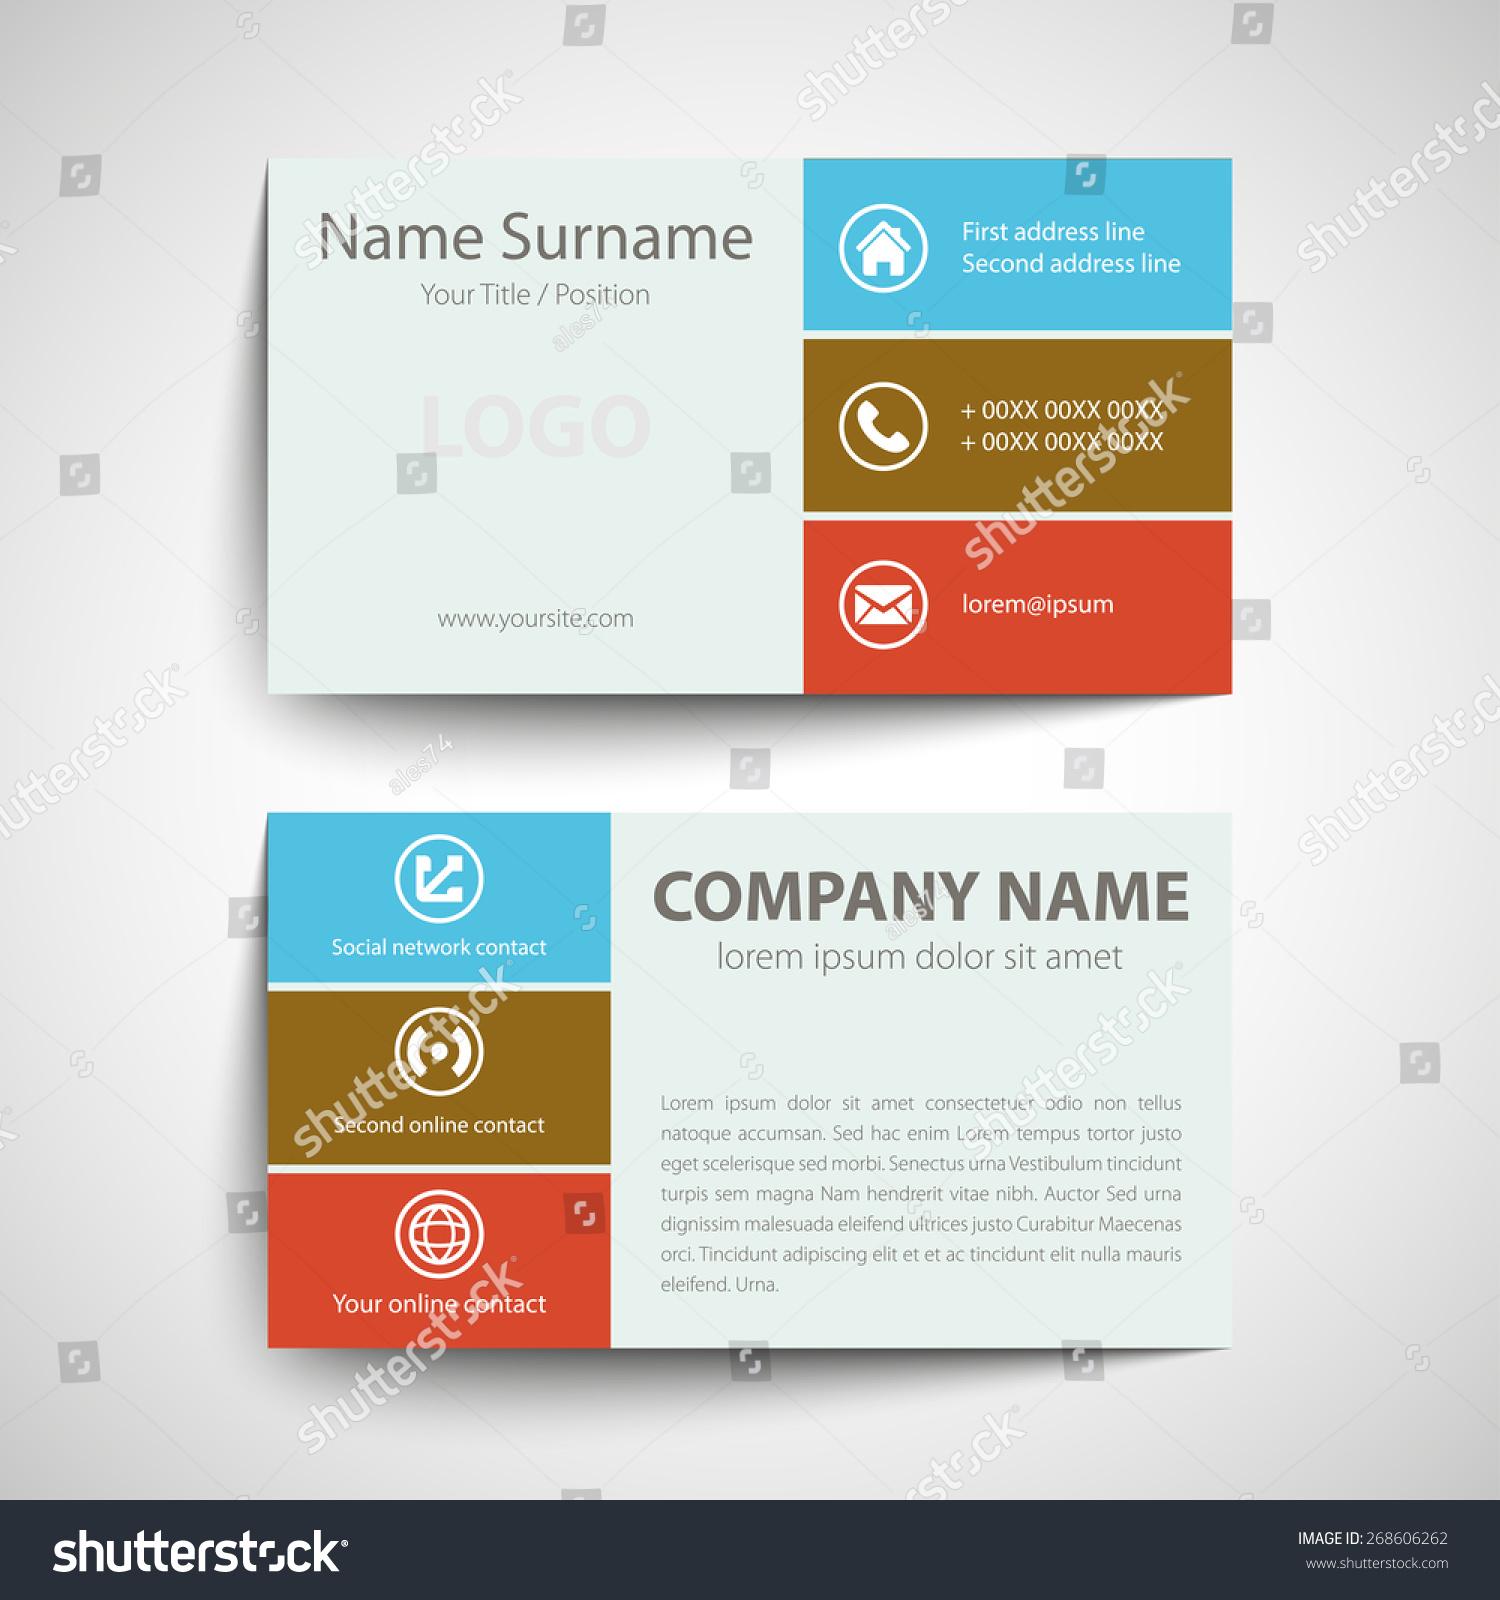 Modern Simple Business Card Template Vector Stock Vector 268606262 ...